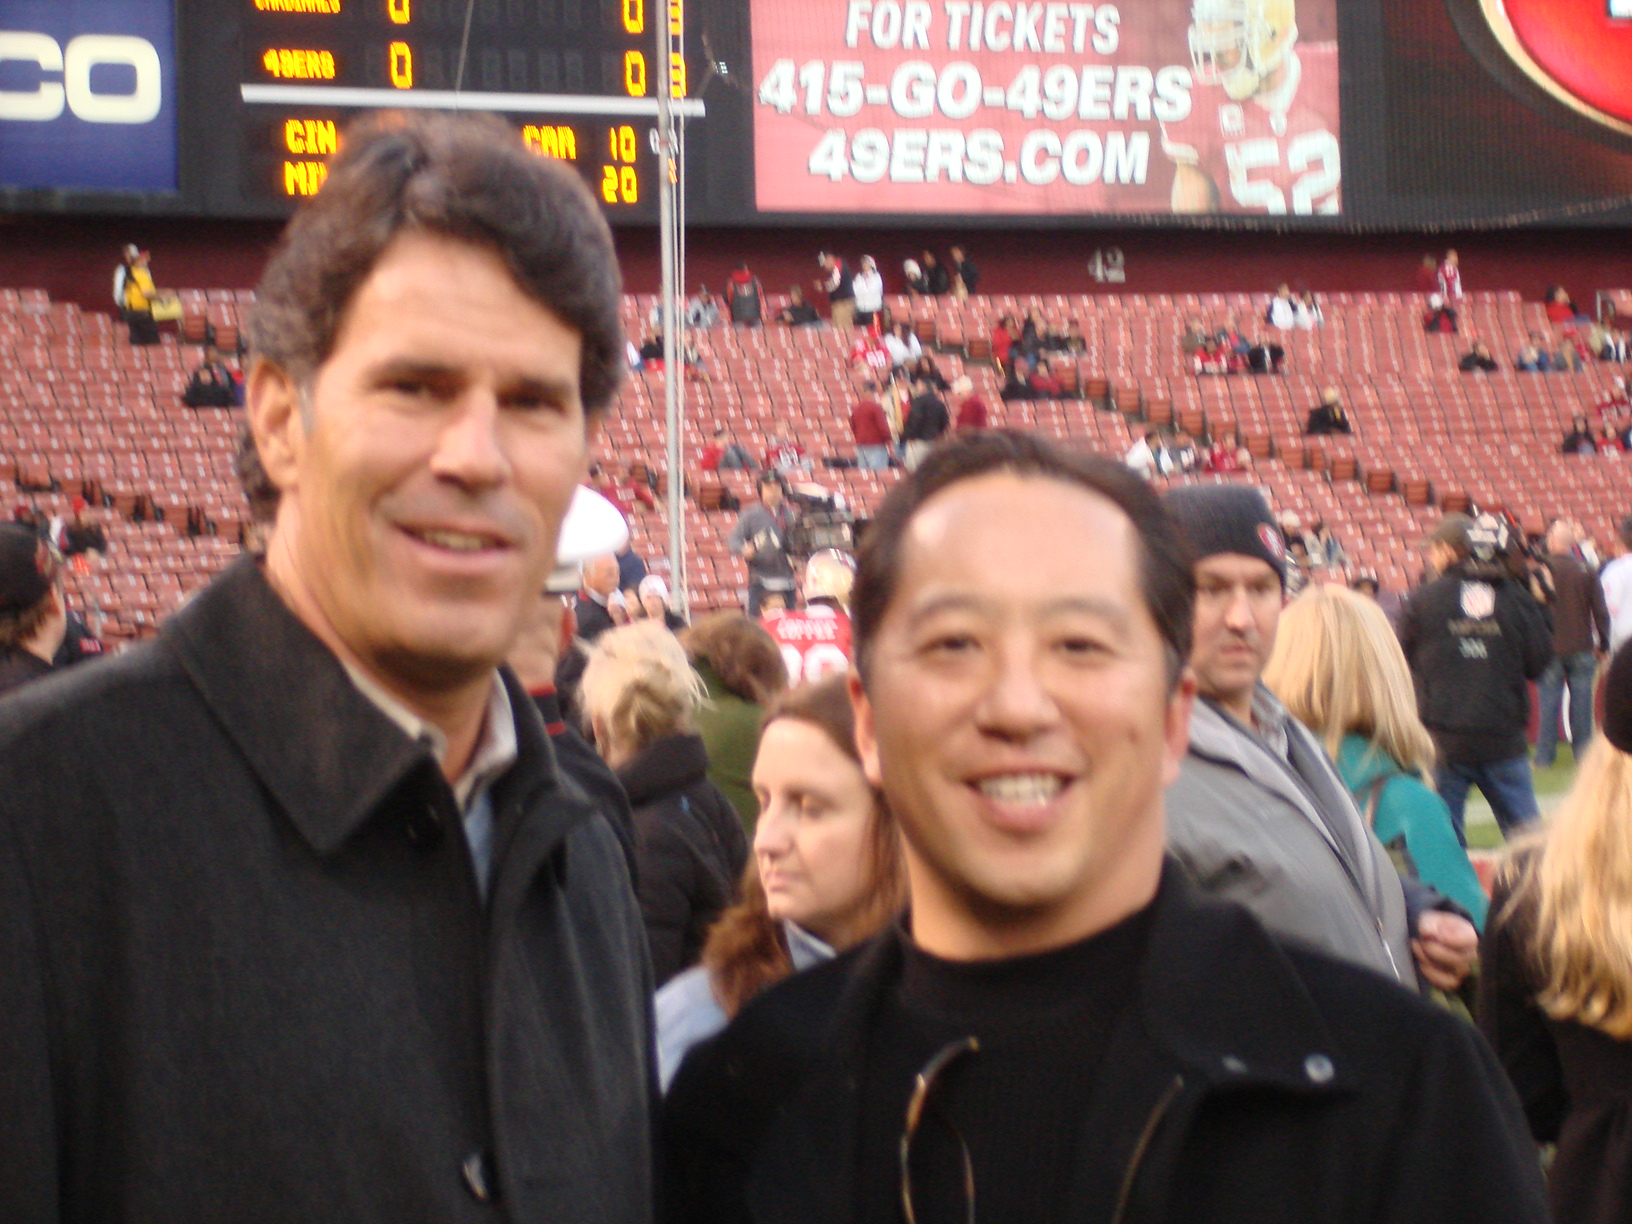 With ex-49er QB Steve Bono